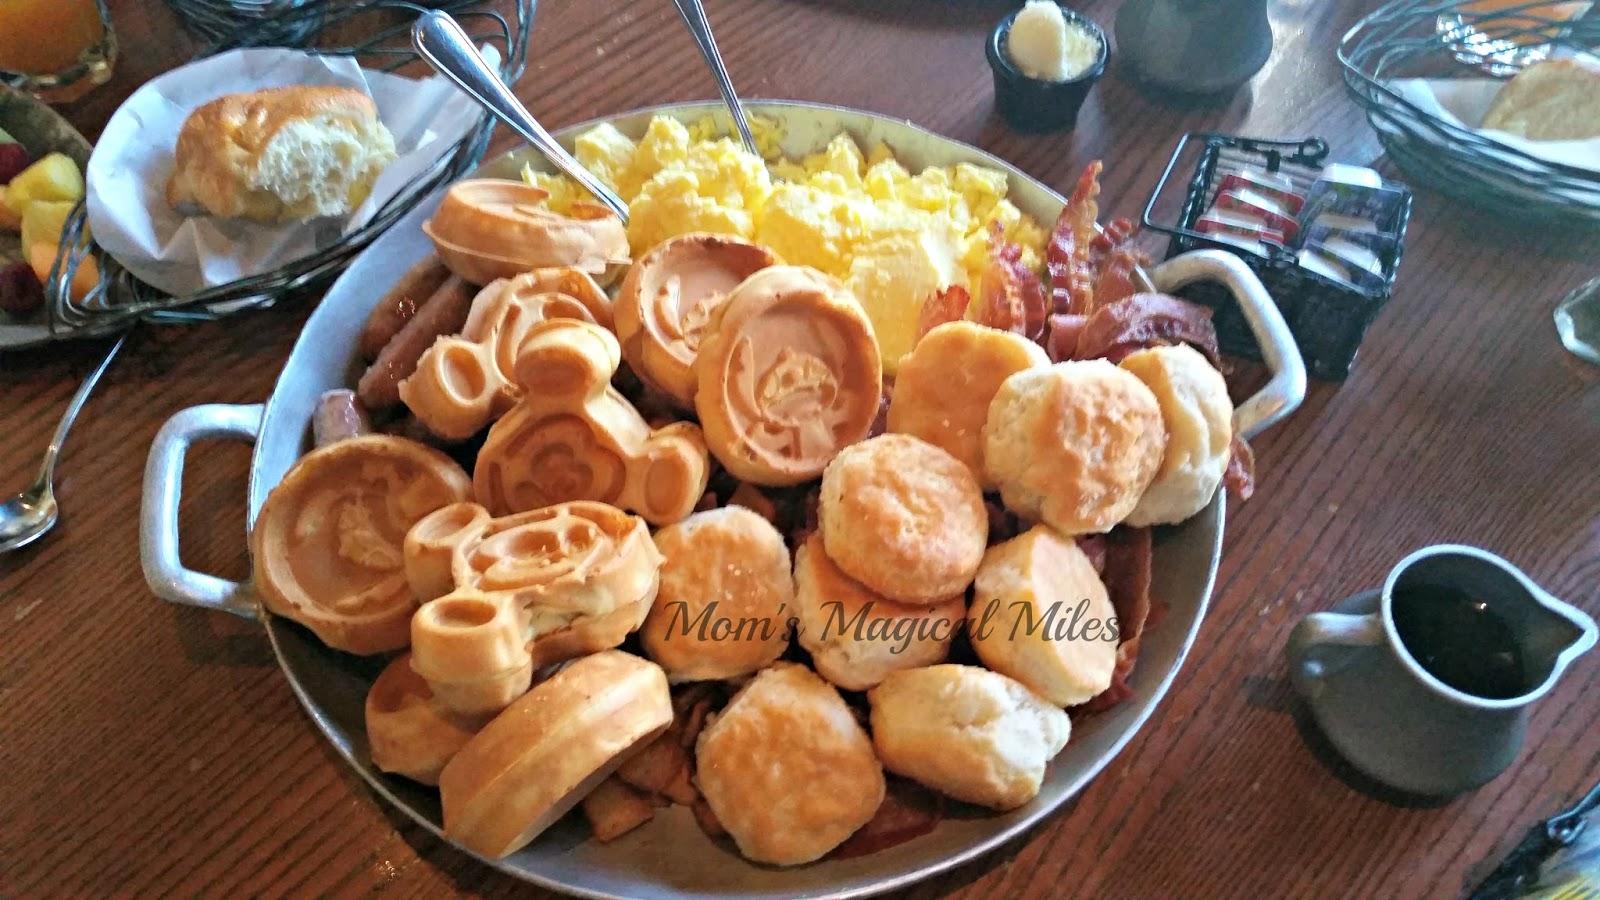 Ohana Breakfast At Walt Disney World Polynesian Resort Yaks Yetis Skippers And The Food Of Wdw Marathon Weekend